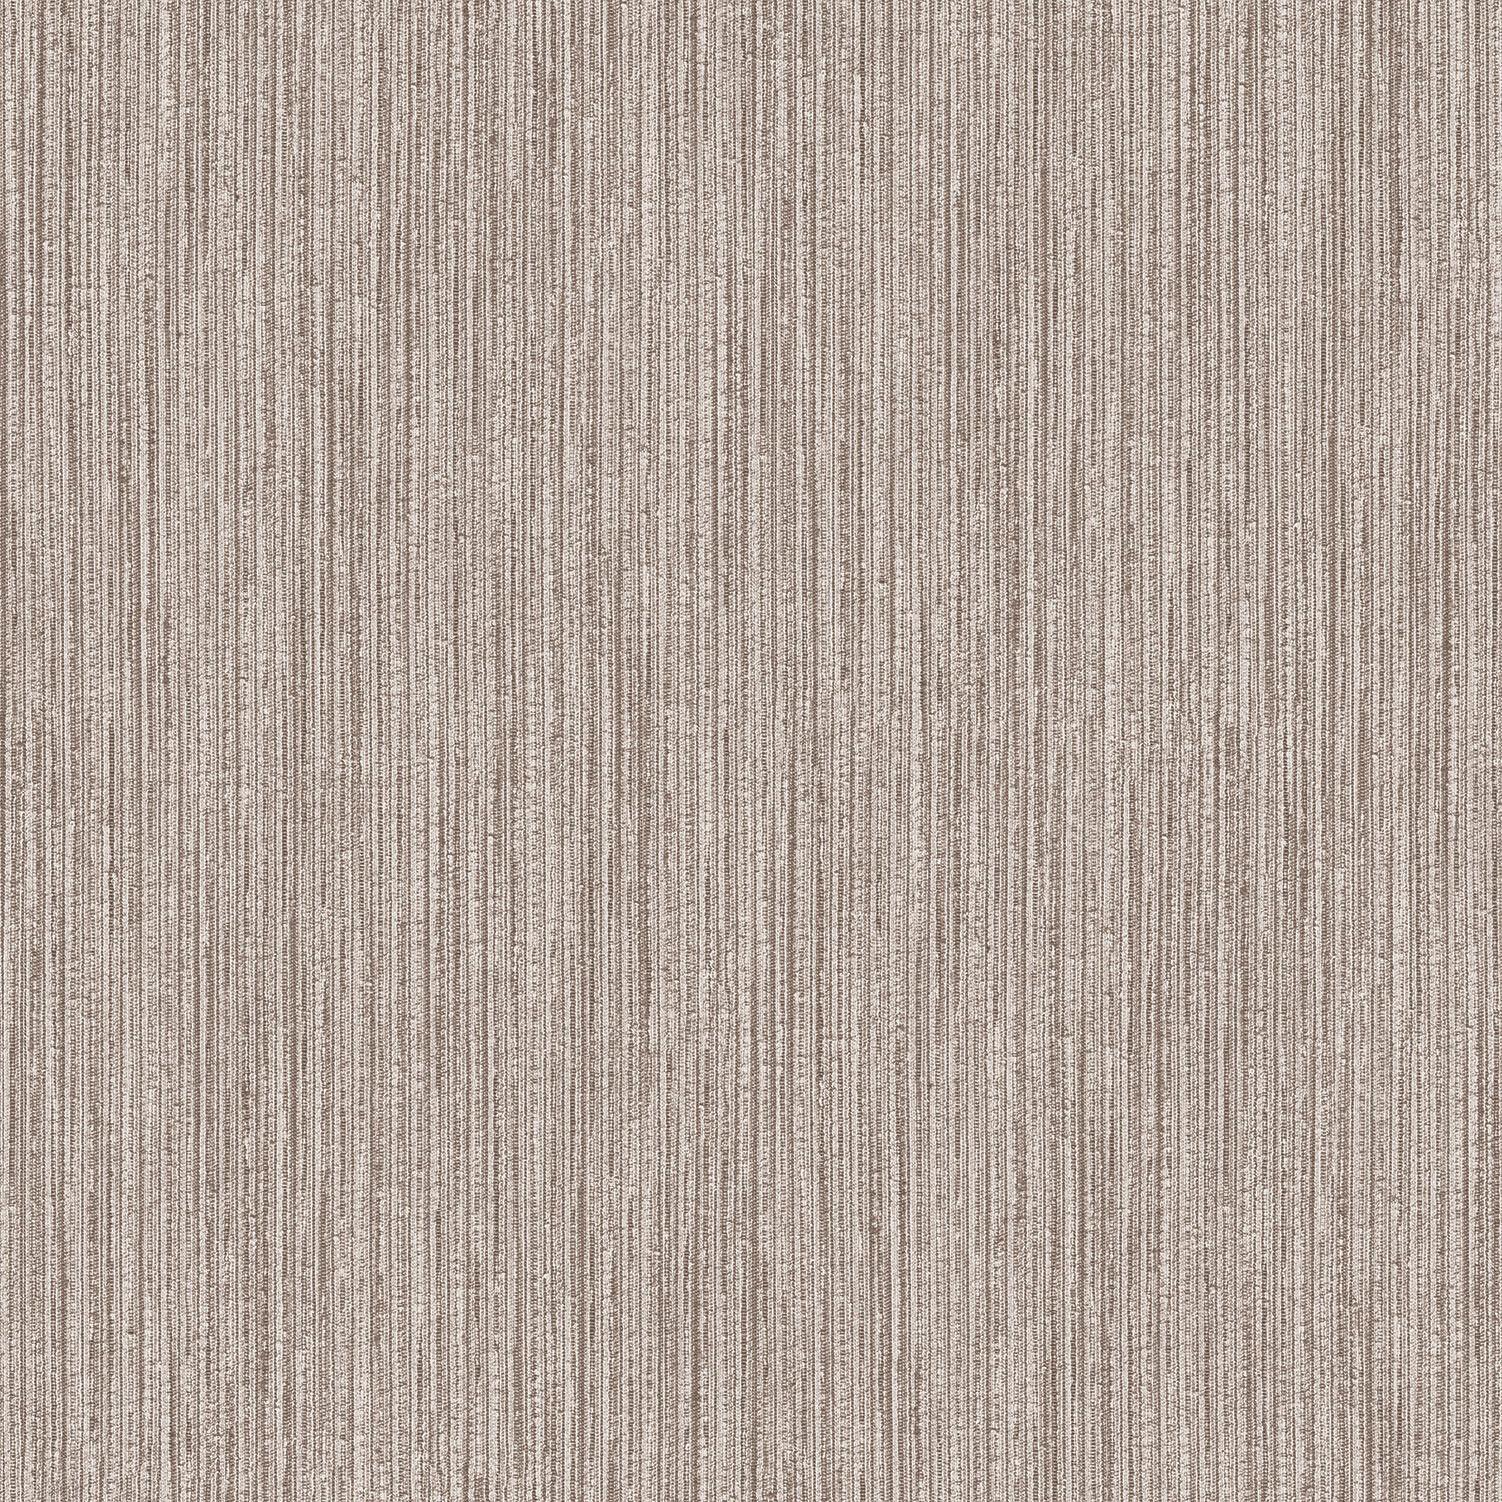 Essener Tapete Special Fx G67683 Stripes Striped Vinyl Fleece Wallpaper